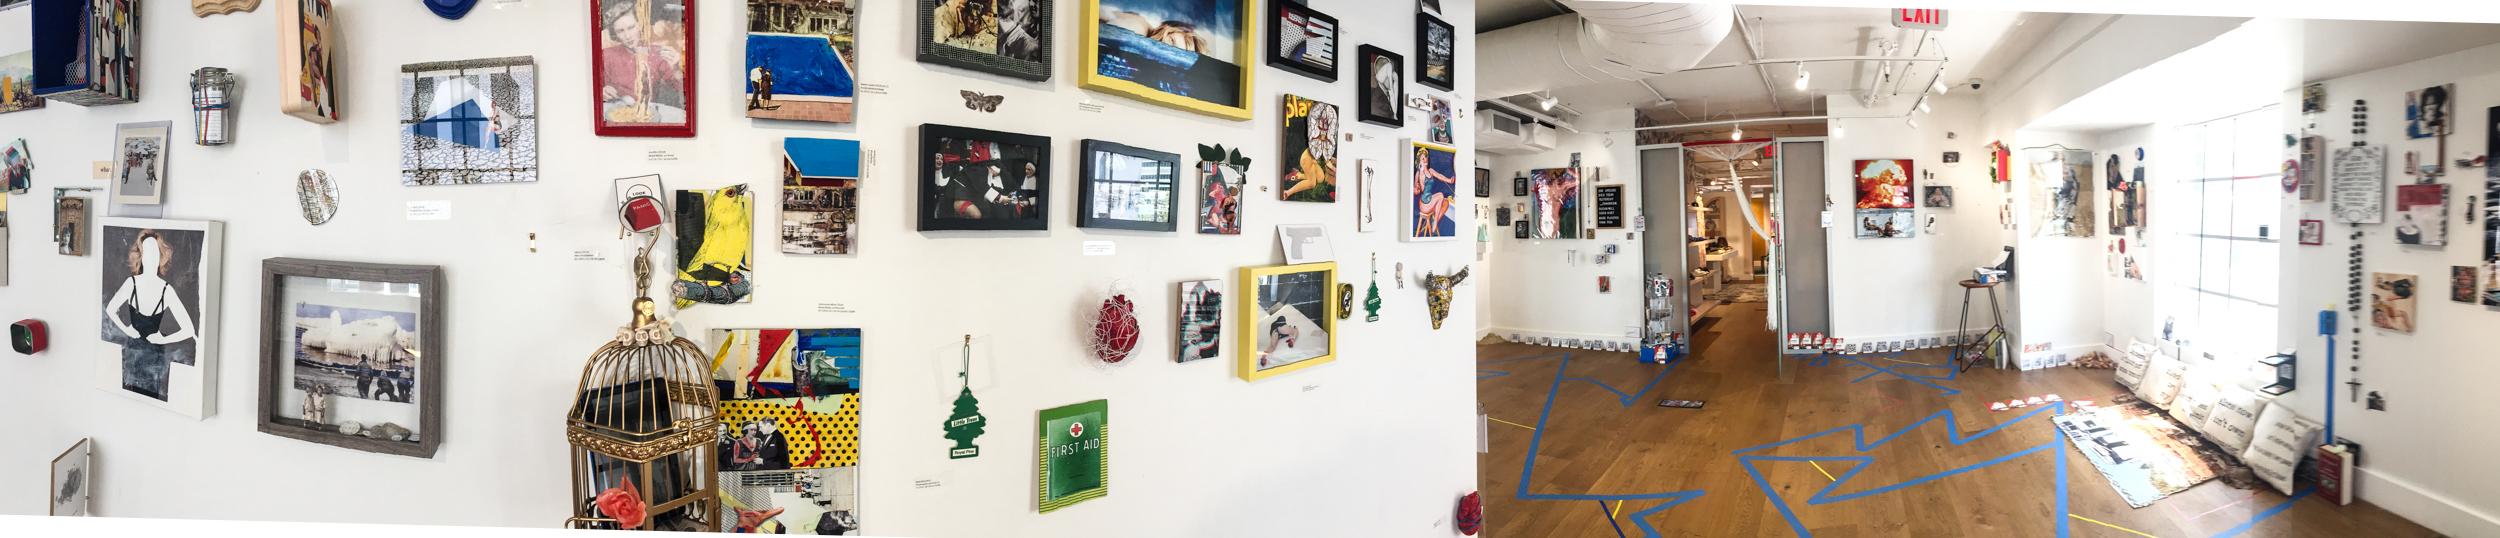 Faena-Exhibition-Images-147.jpg